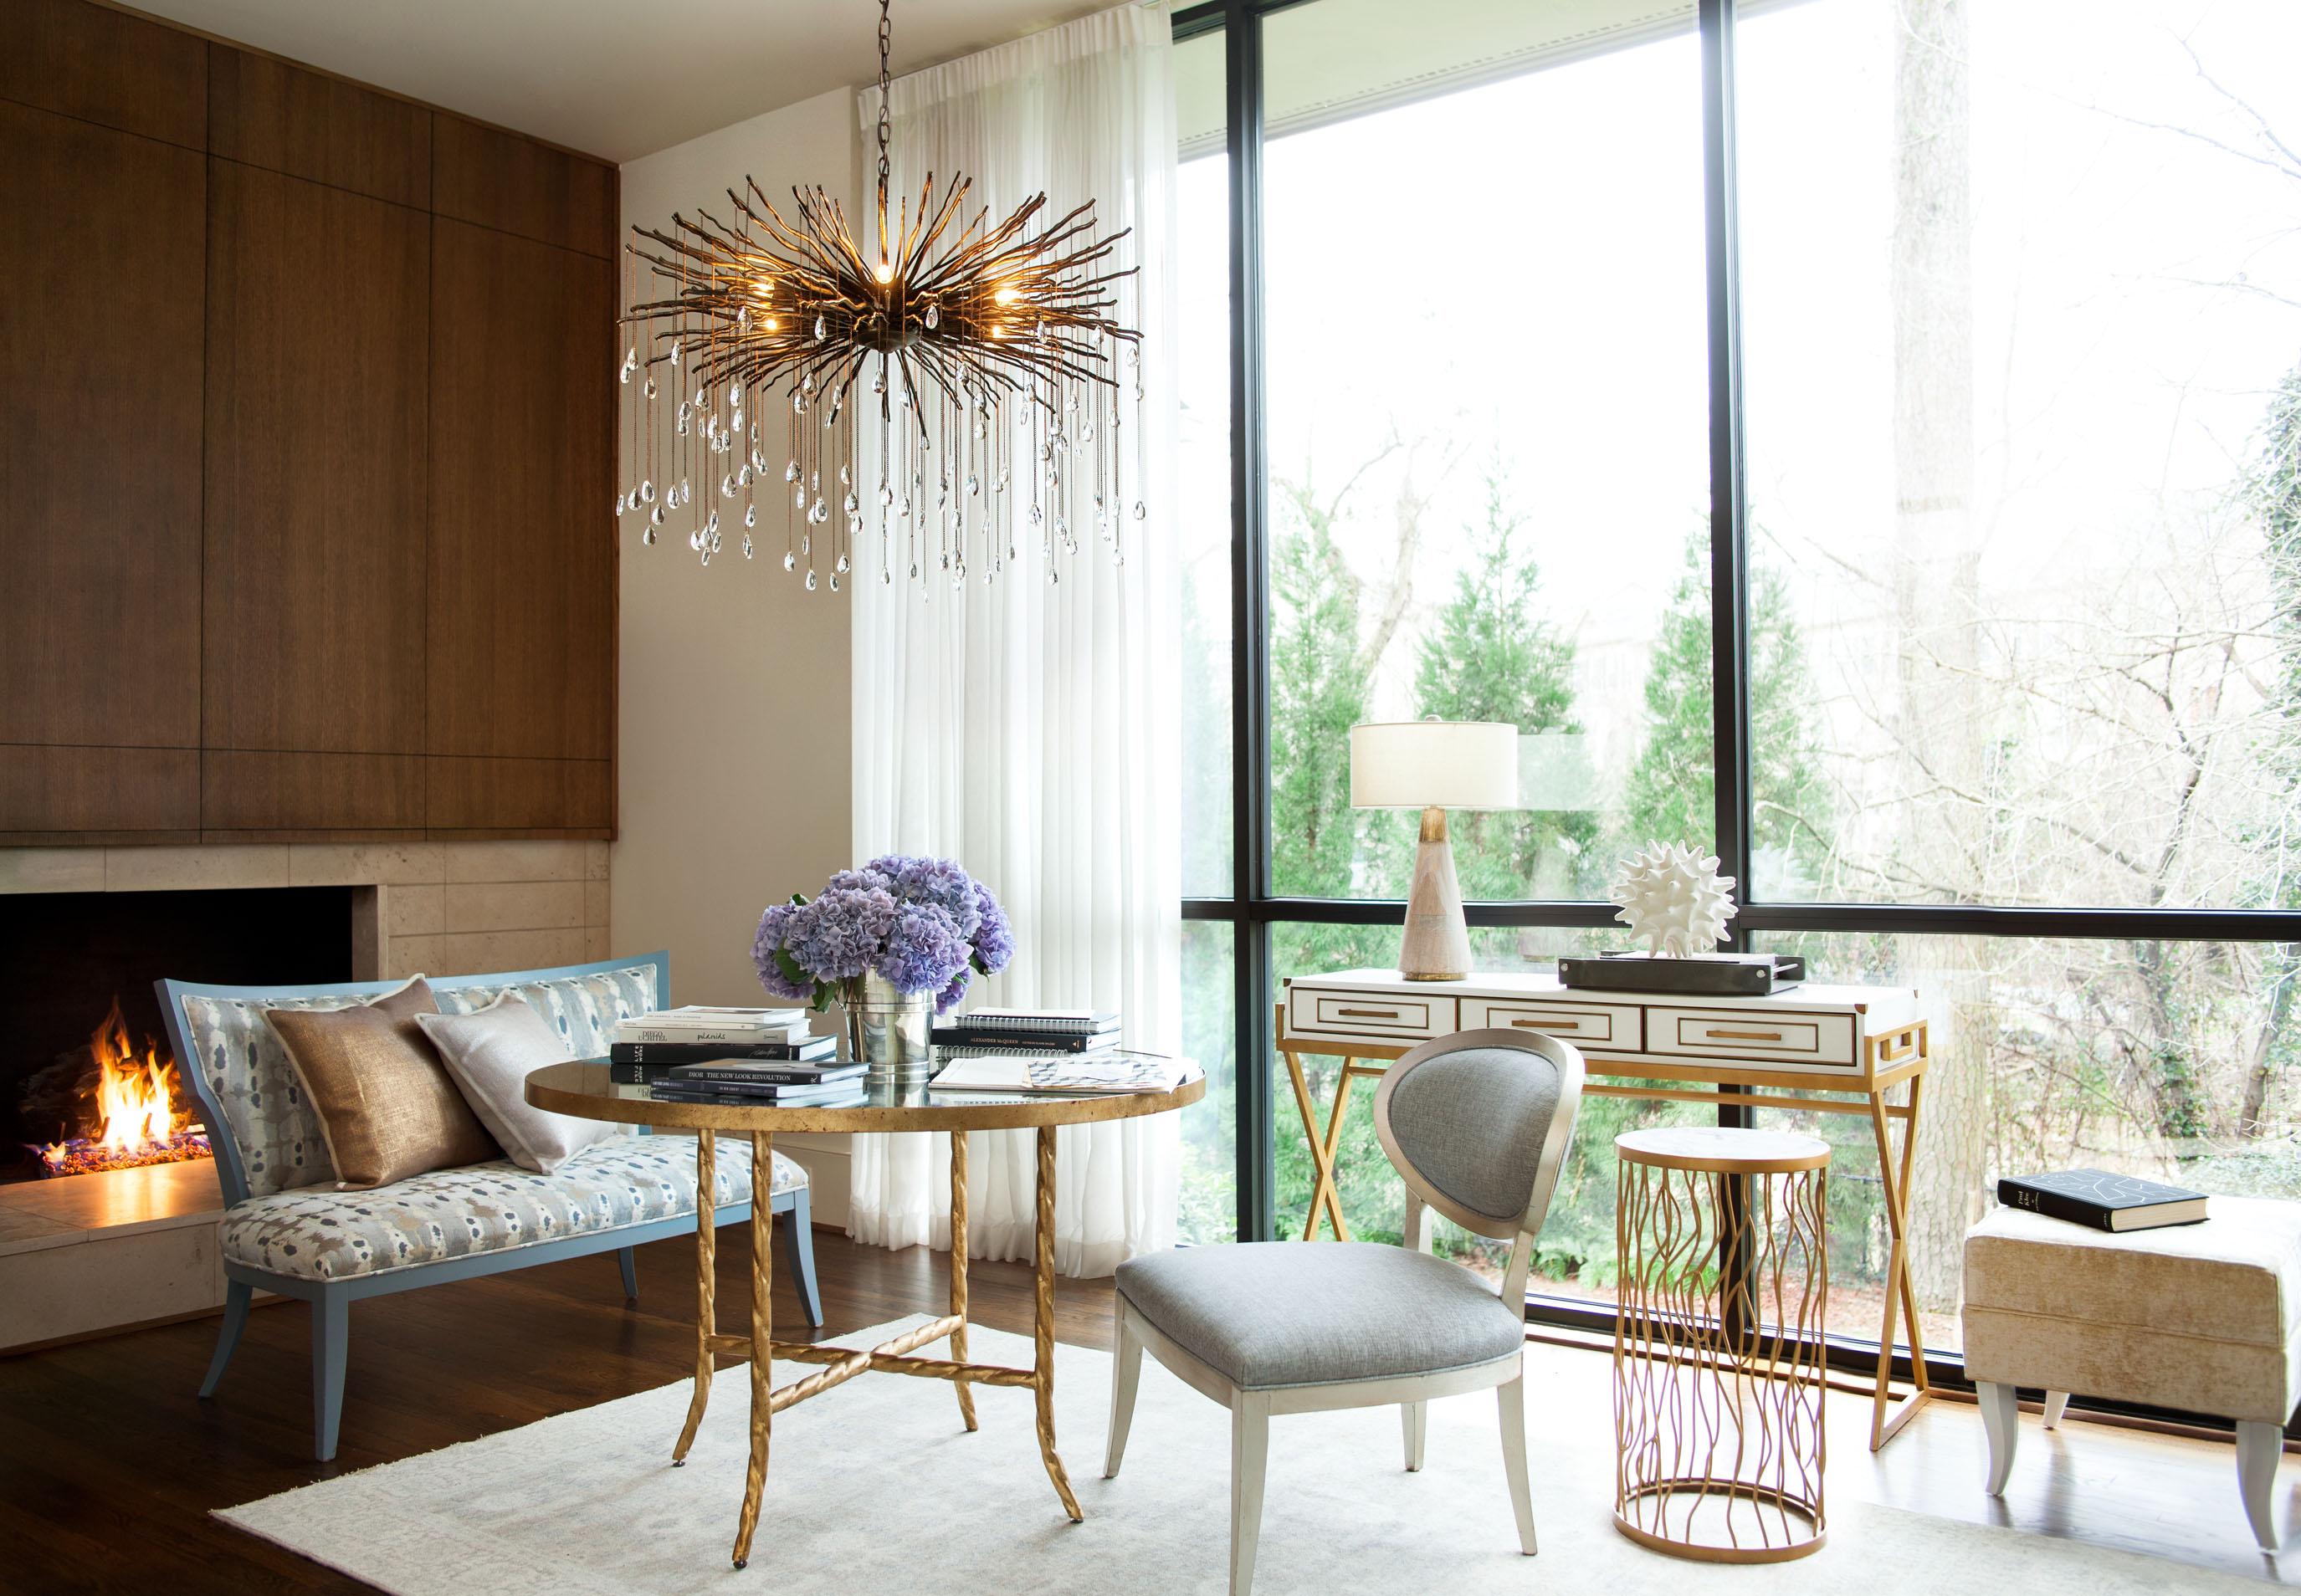 Living Room Light And Furniture Washington Dc, Maryland, Va